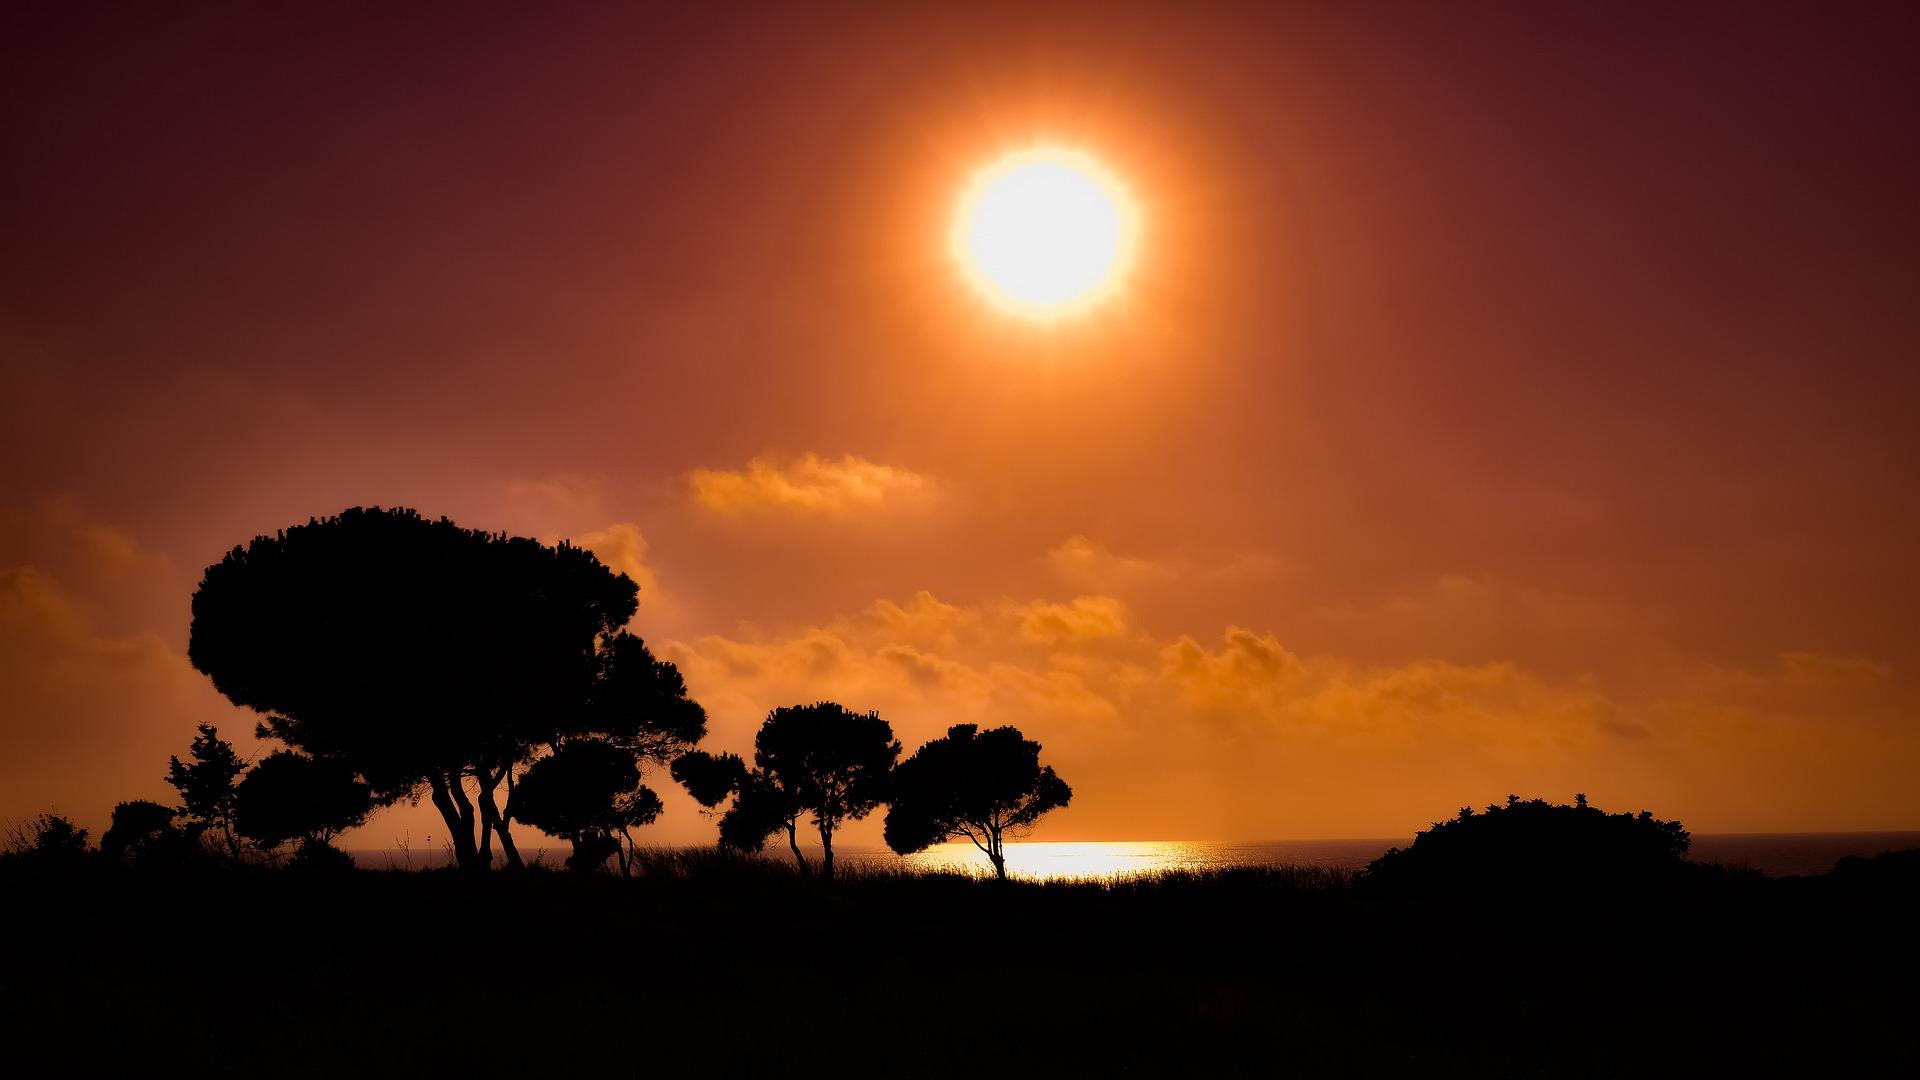 sunset-4437373_1920 (1)